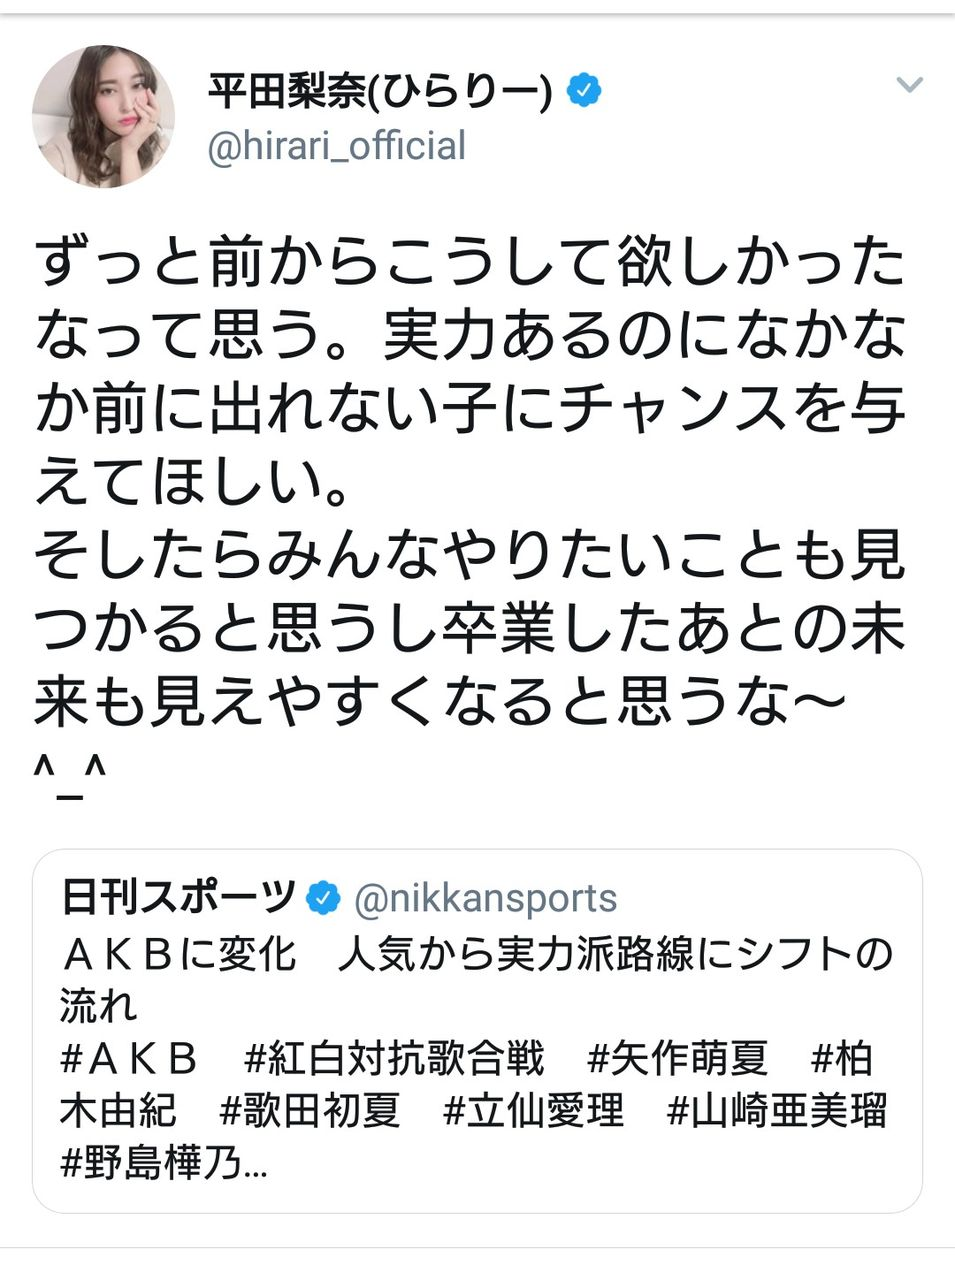 AKB48の新しい「努力目標」に賛否両論